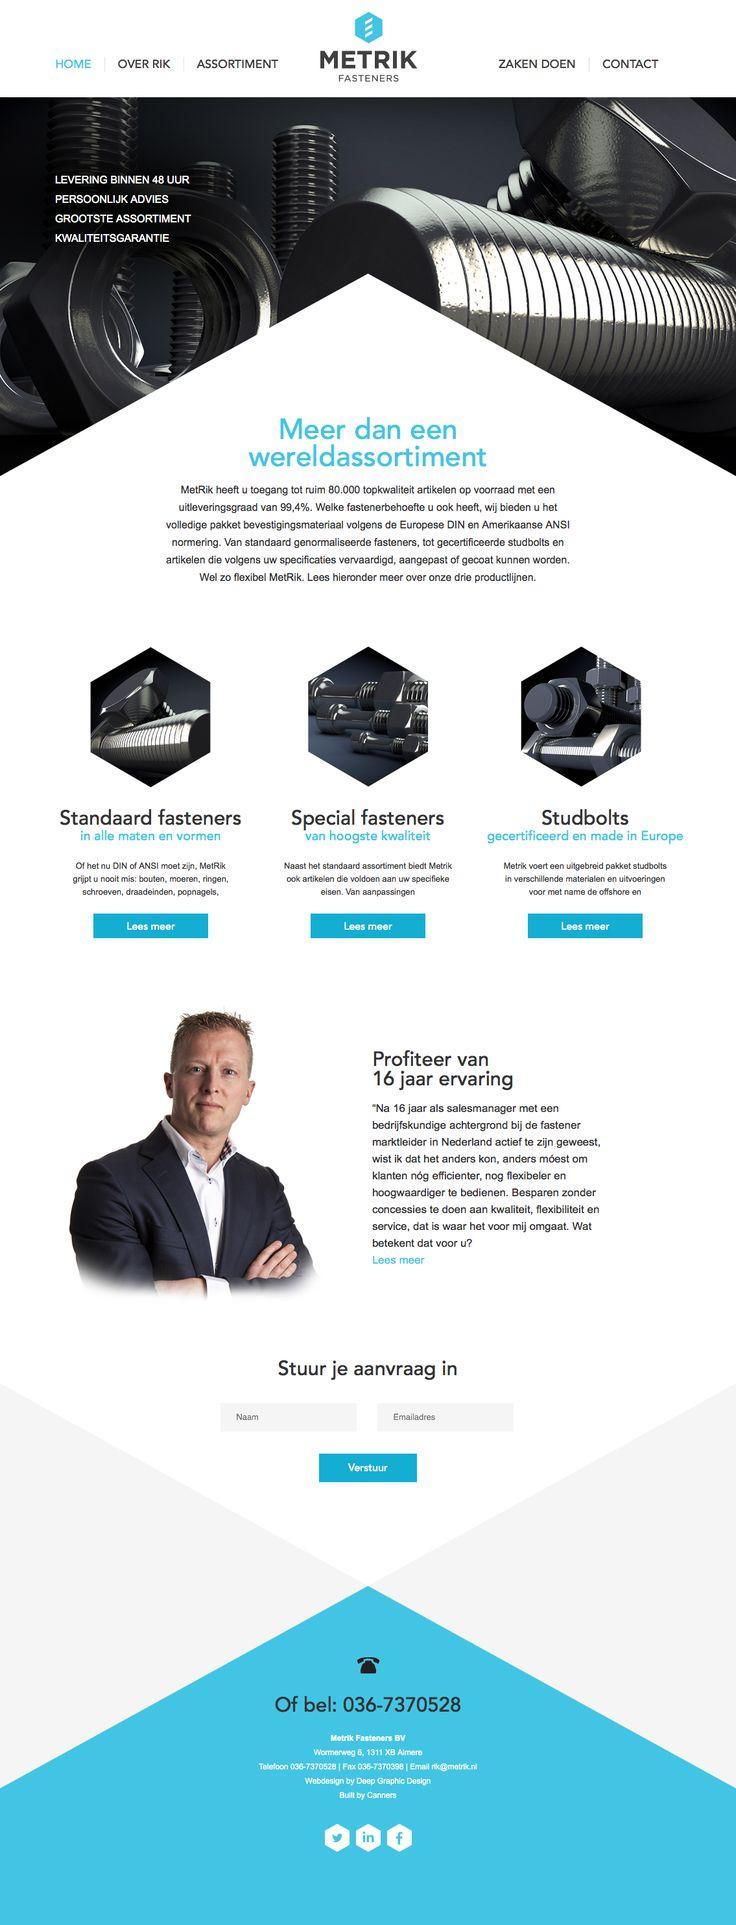 Webdesign hompage for Metrik Fasteners in The Netherlands.